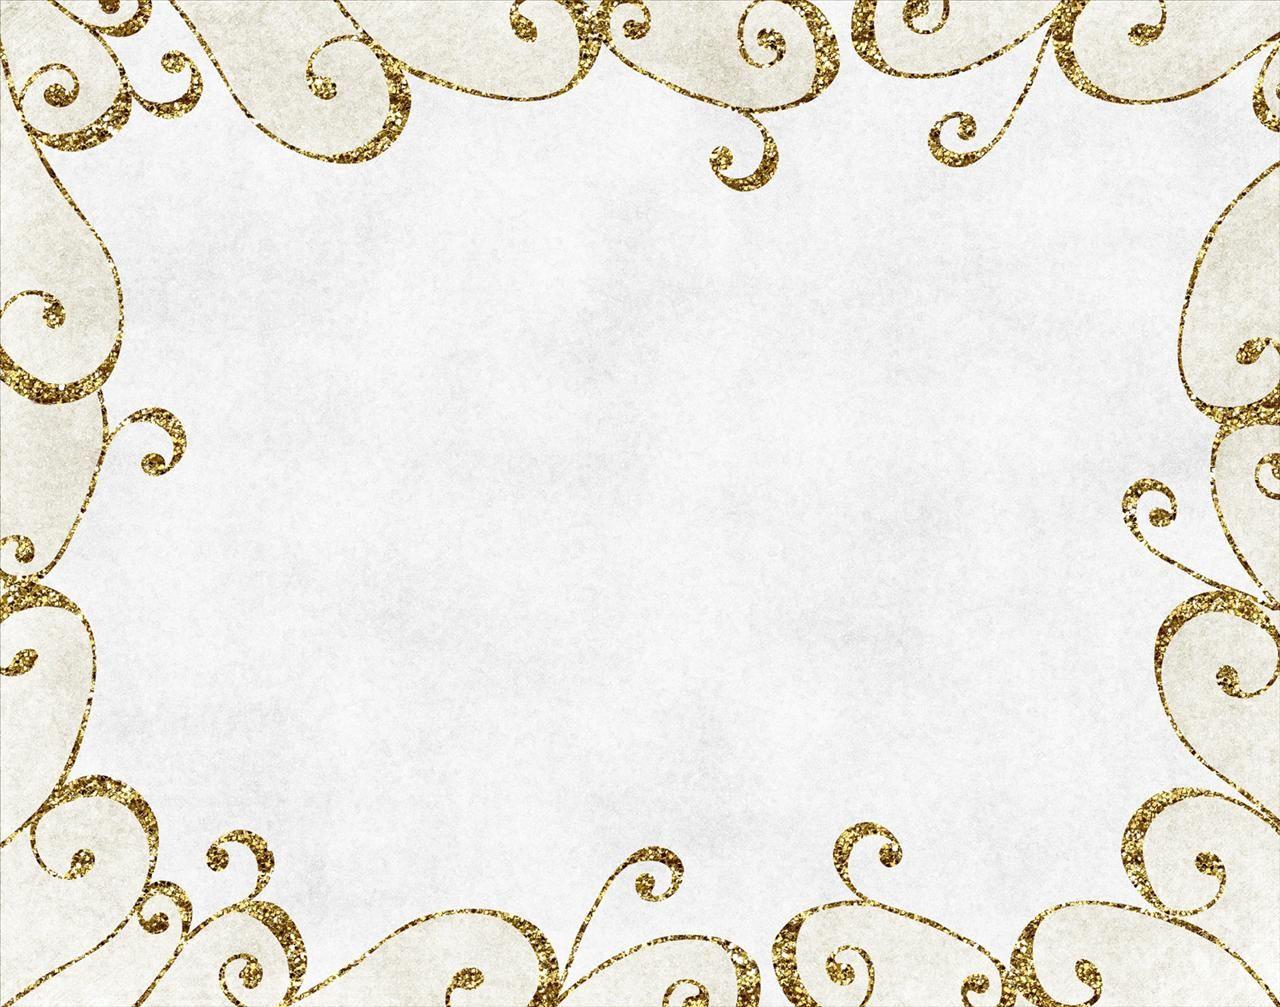 Decorative borders for microsoft word fancy page borders for microsoft - Fancy Gold Page Border Designs